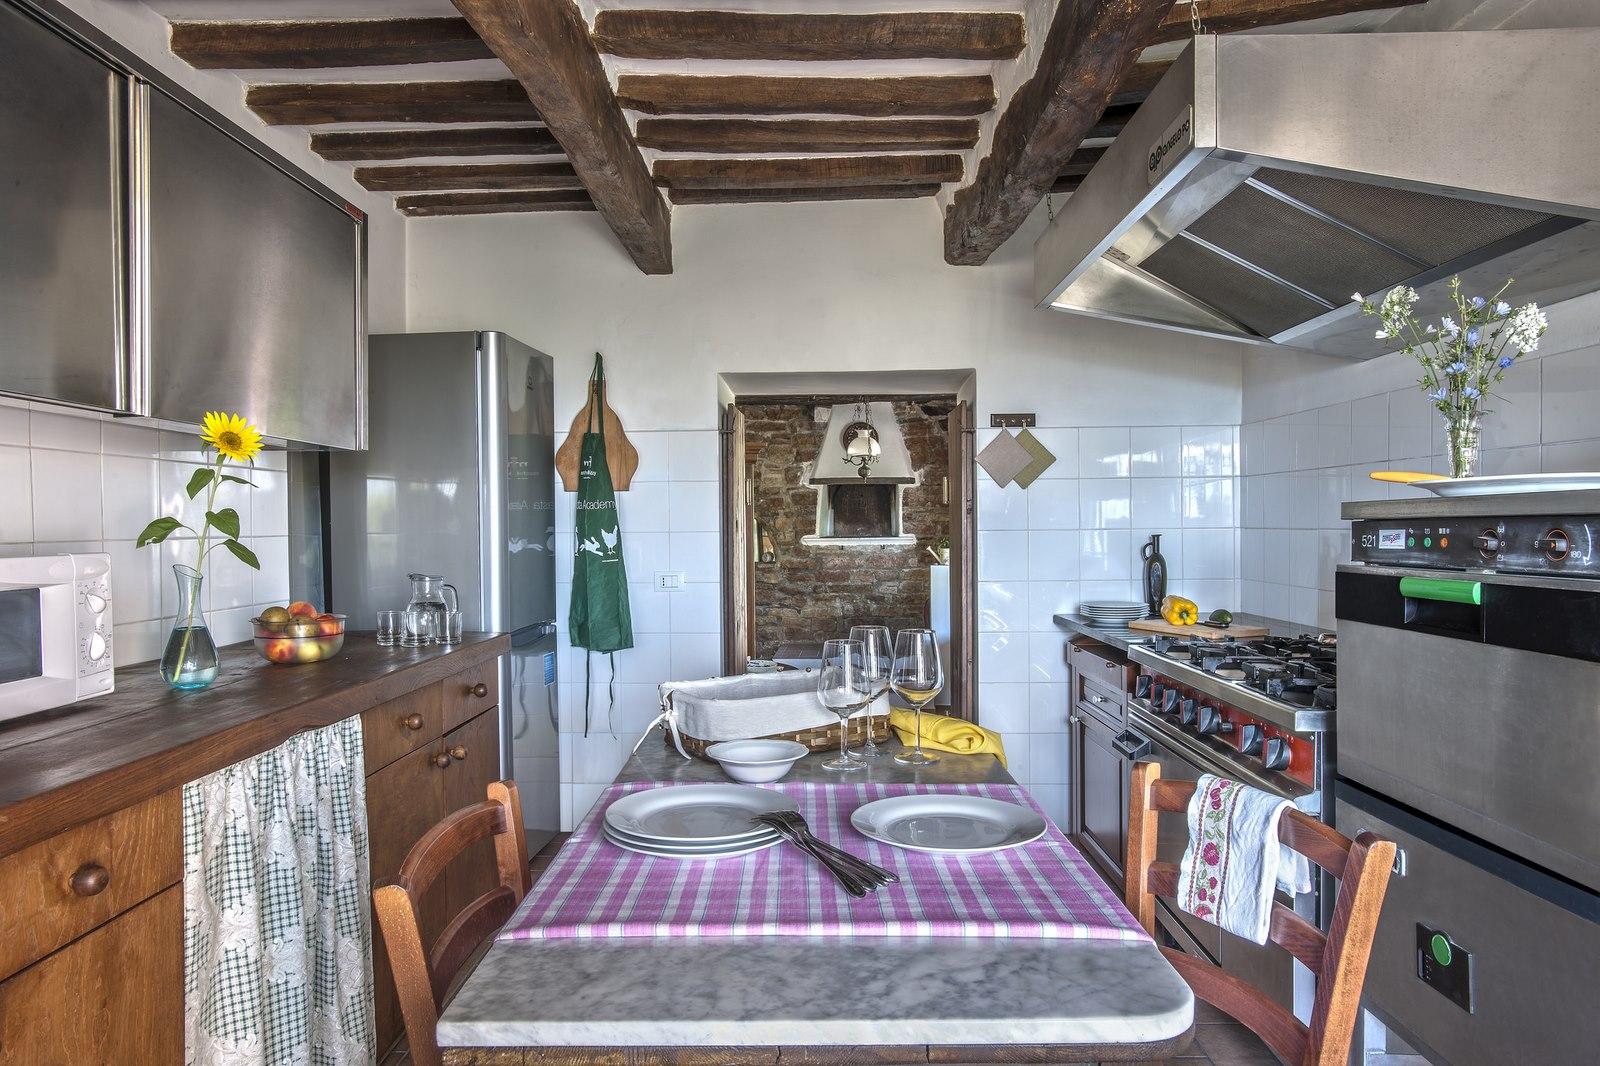 Ferienhaus La Quiete dei Re (2236092), Cagli, Pesaro und Urbino, Marken, Italien, Bild 17